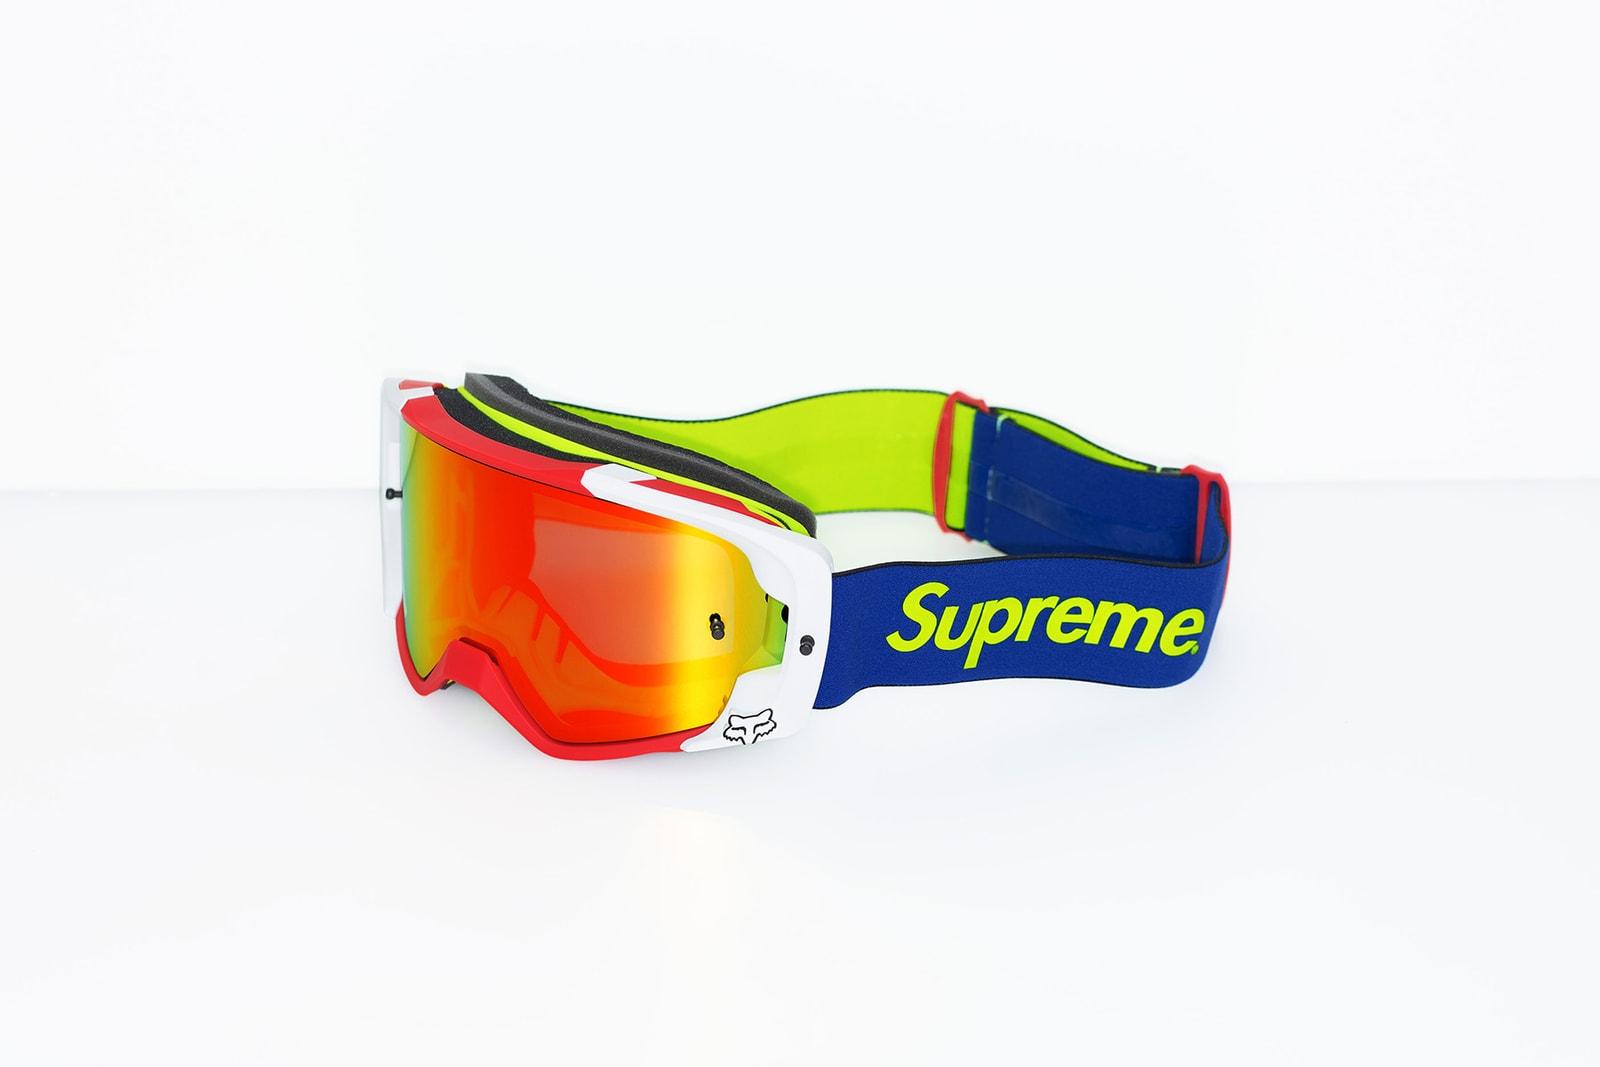 Supreme fox racing helmet Spring/Summer 2018 Drop 12 Release palace BAPE a cold wall kendrick lamar tde nike dragon ball z prada richardson